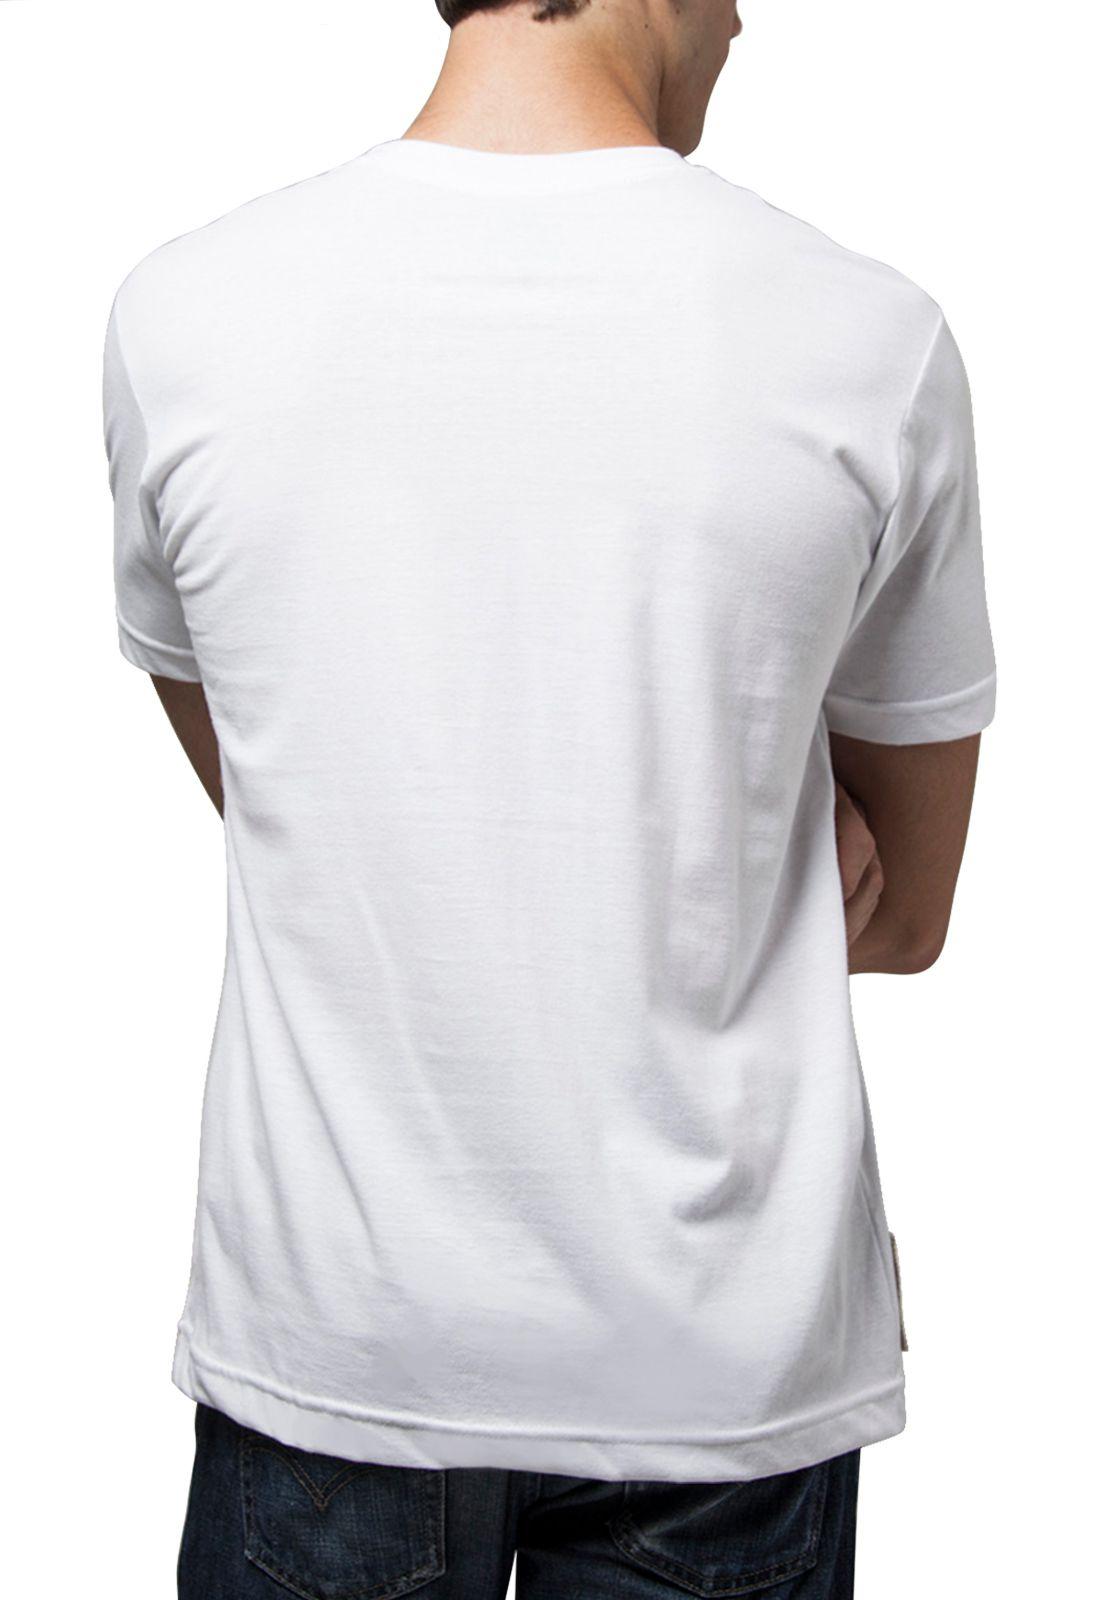 Camiseta Amazônia Caveira - Branco